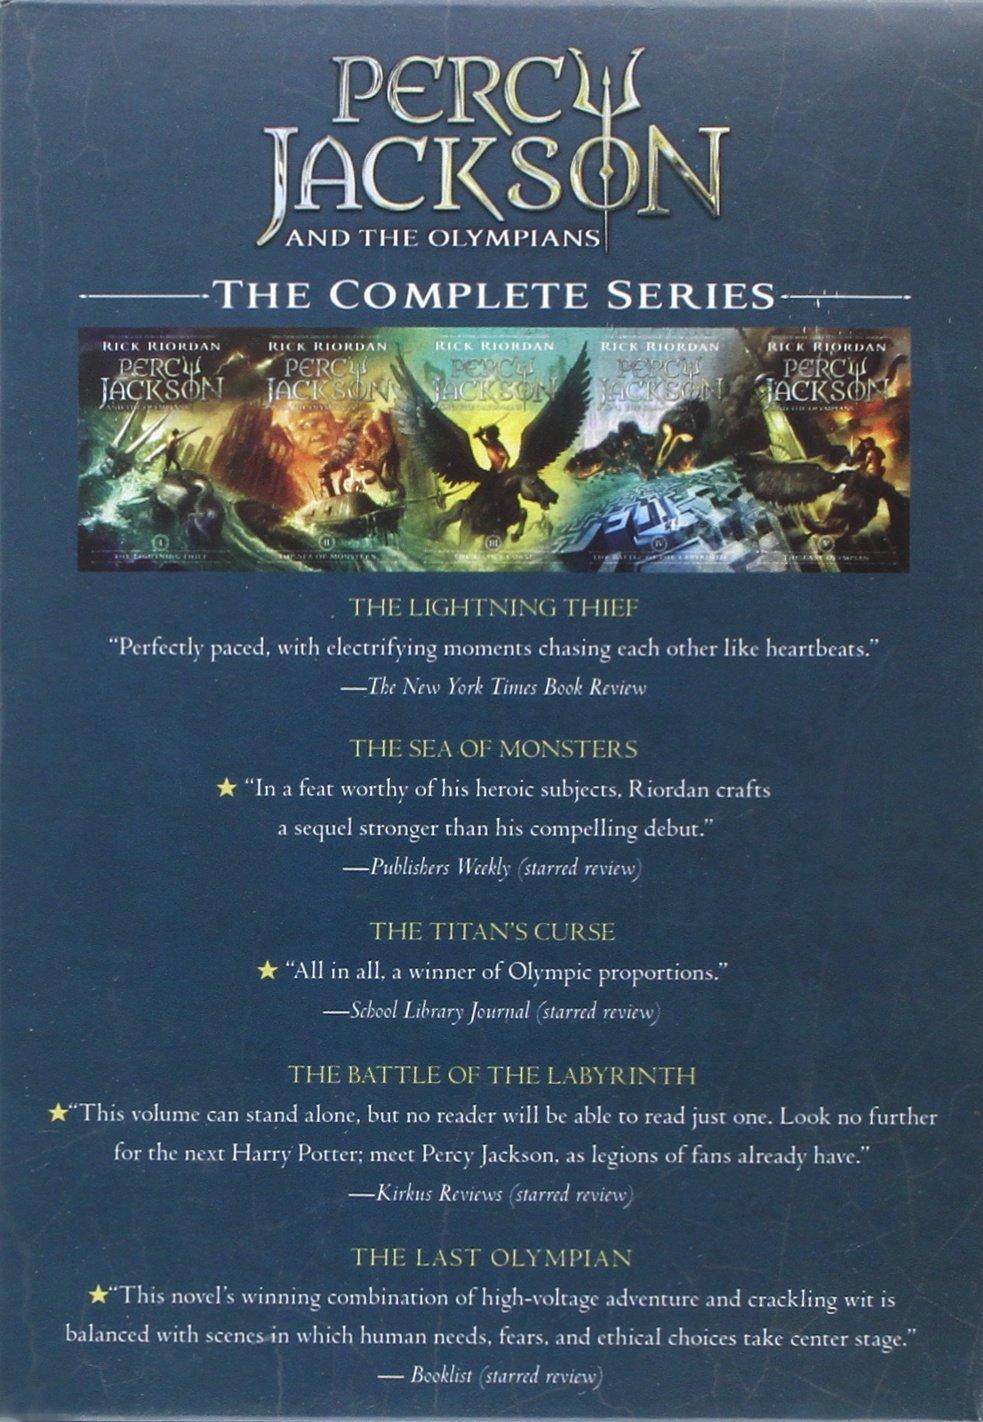 Riordan, R: Percy Jackson and the Olympians Percy Jackson & the Olympians: Amazon.es: Riordan, Rick: Libros en idiomas extranjeros